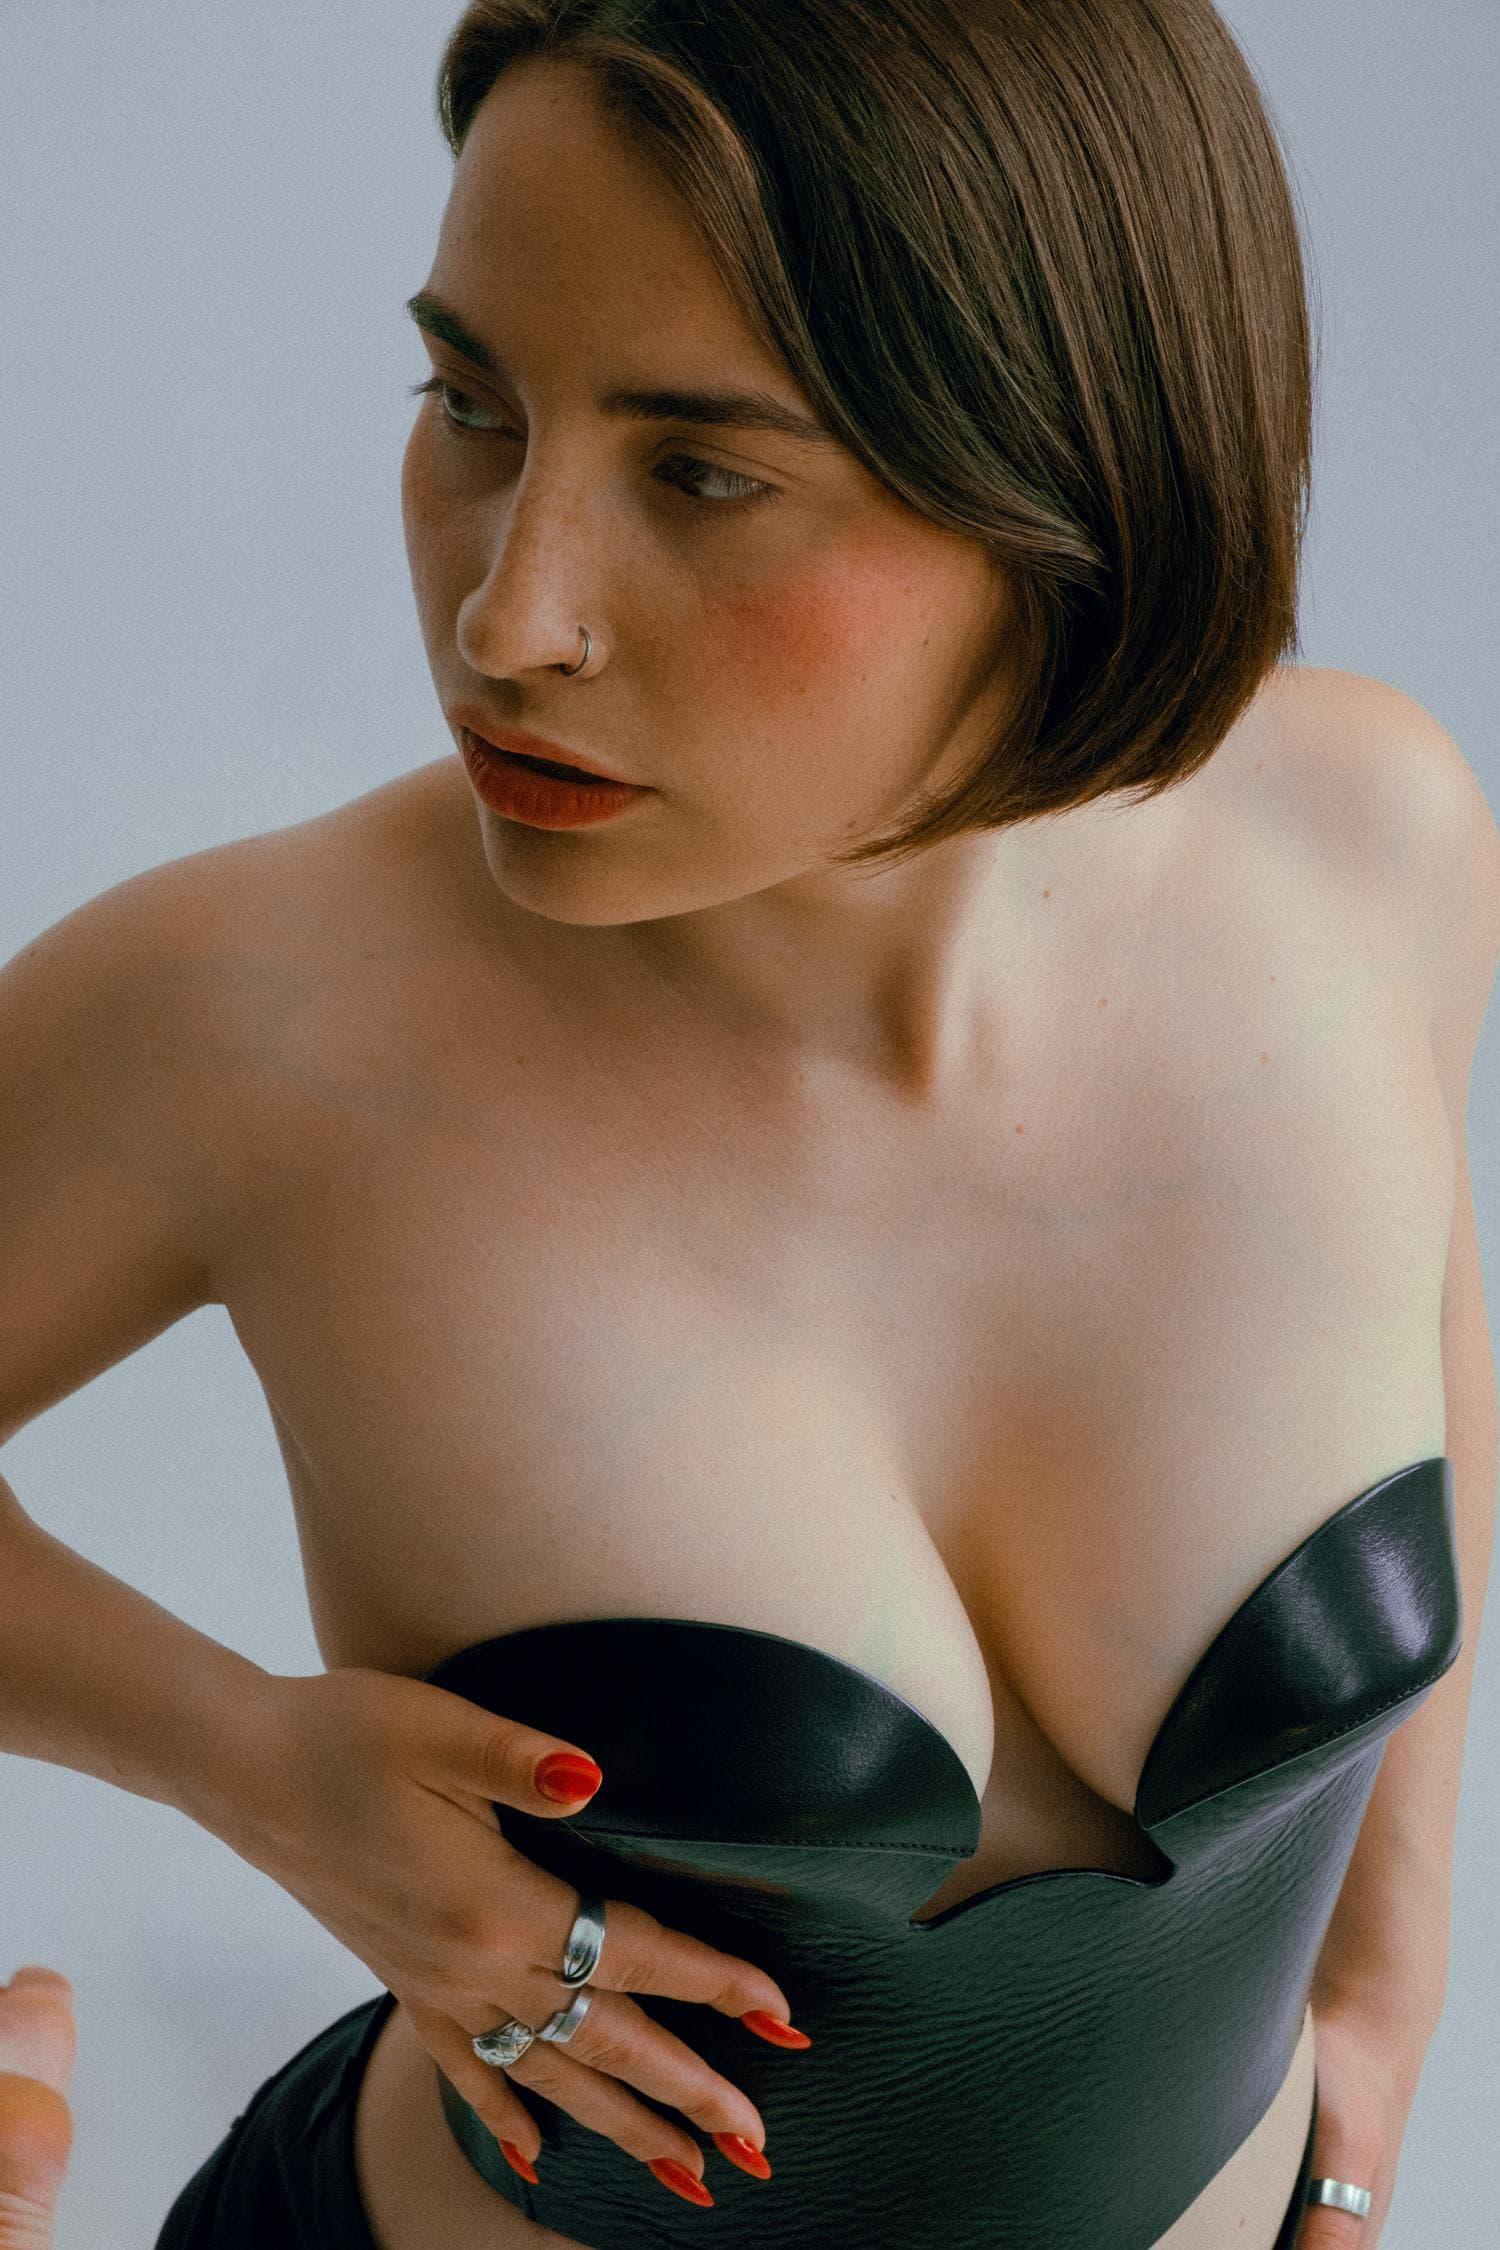 fotografia boudoir mujer corsé